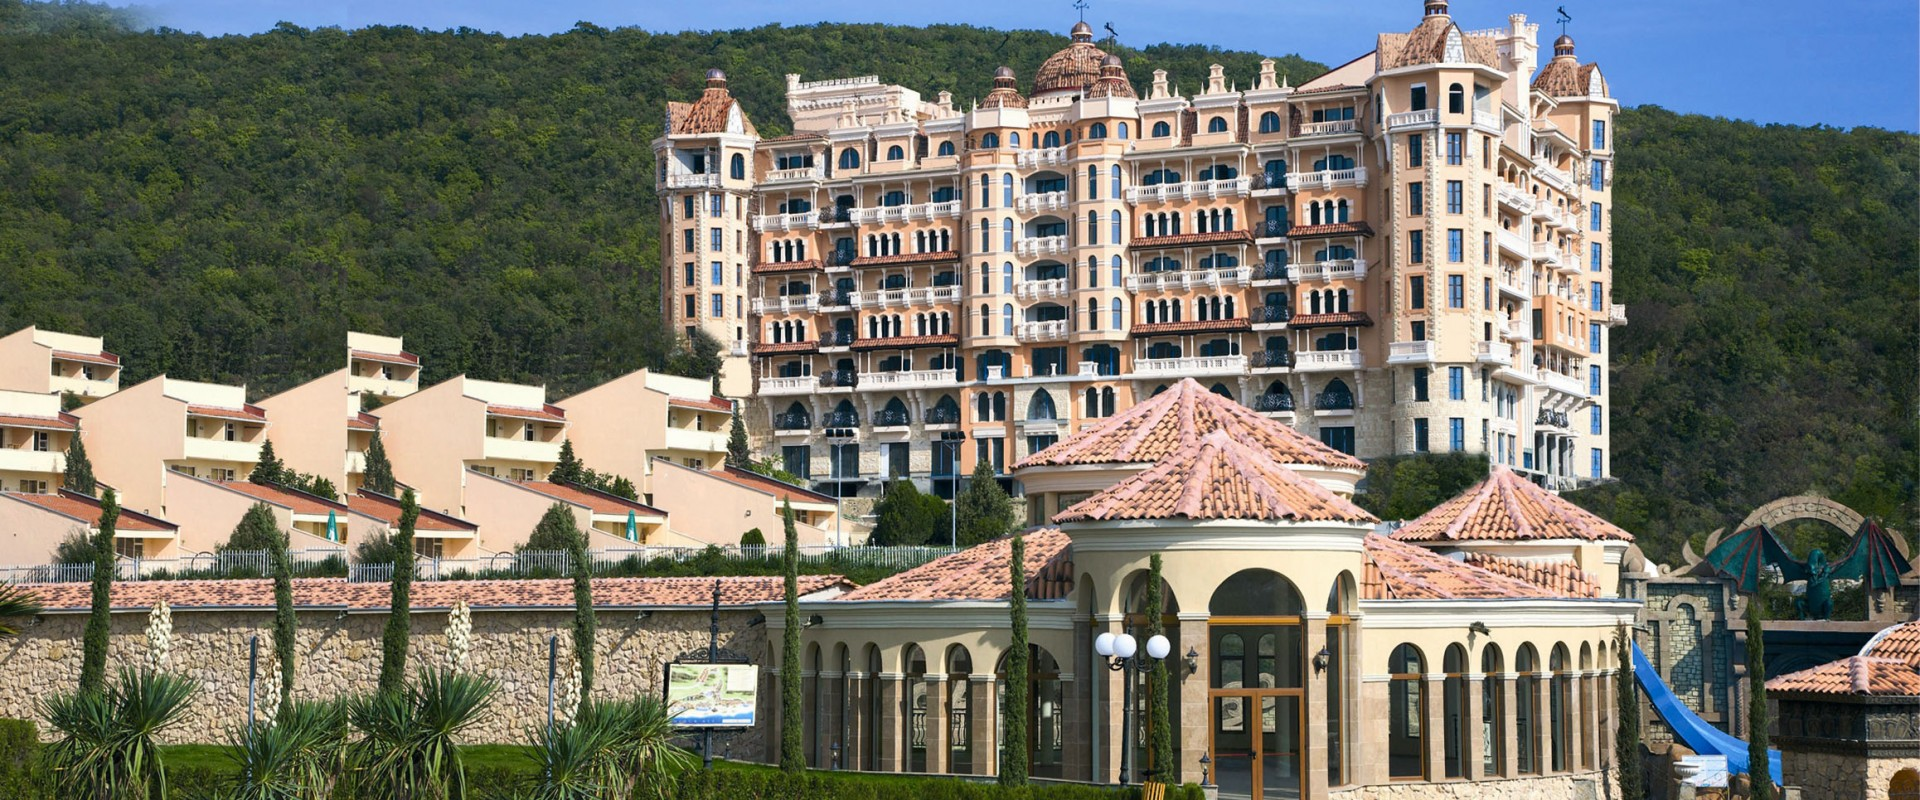 Vacanță la mare în Bulgaria, Elenite, Hotel Royal Castle